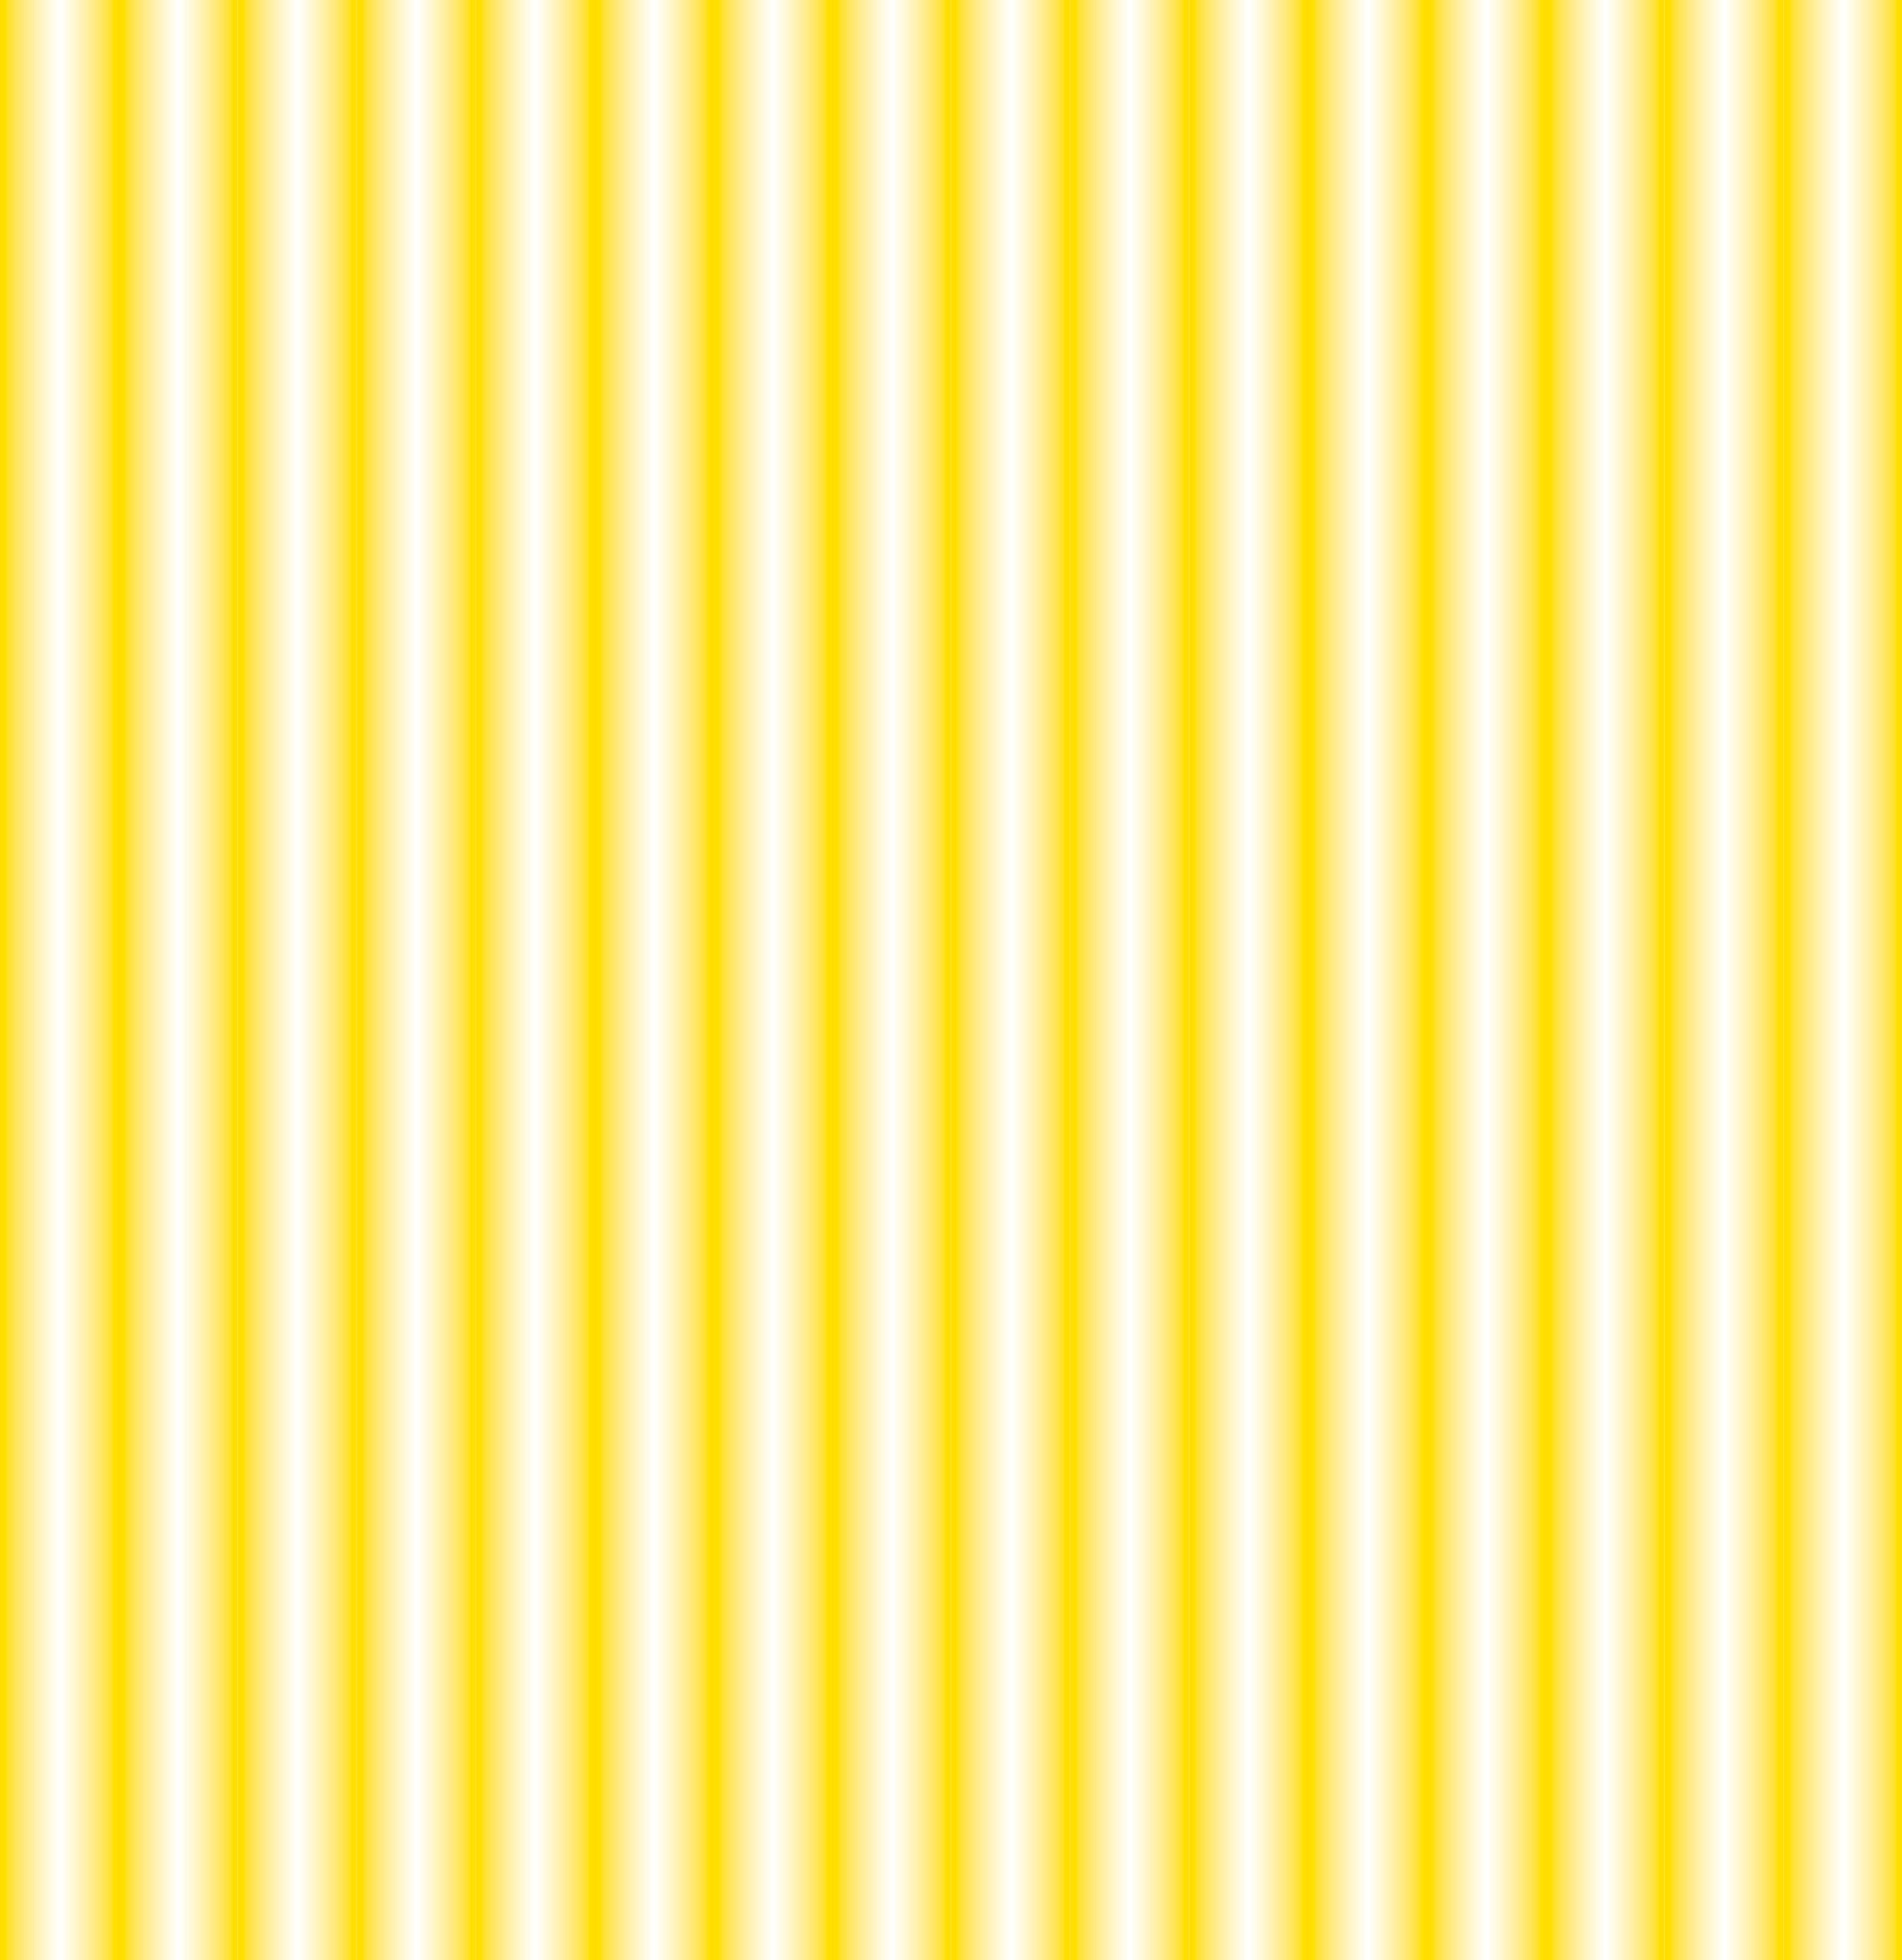 [48+] Yellow and White Wallpaper on WallpaperSafari